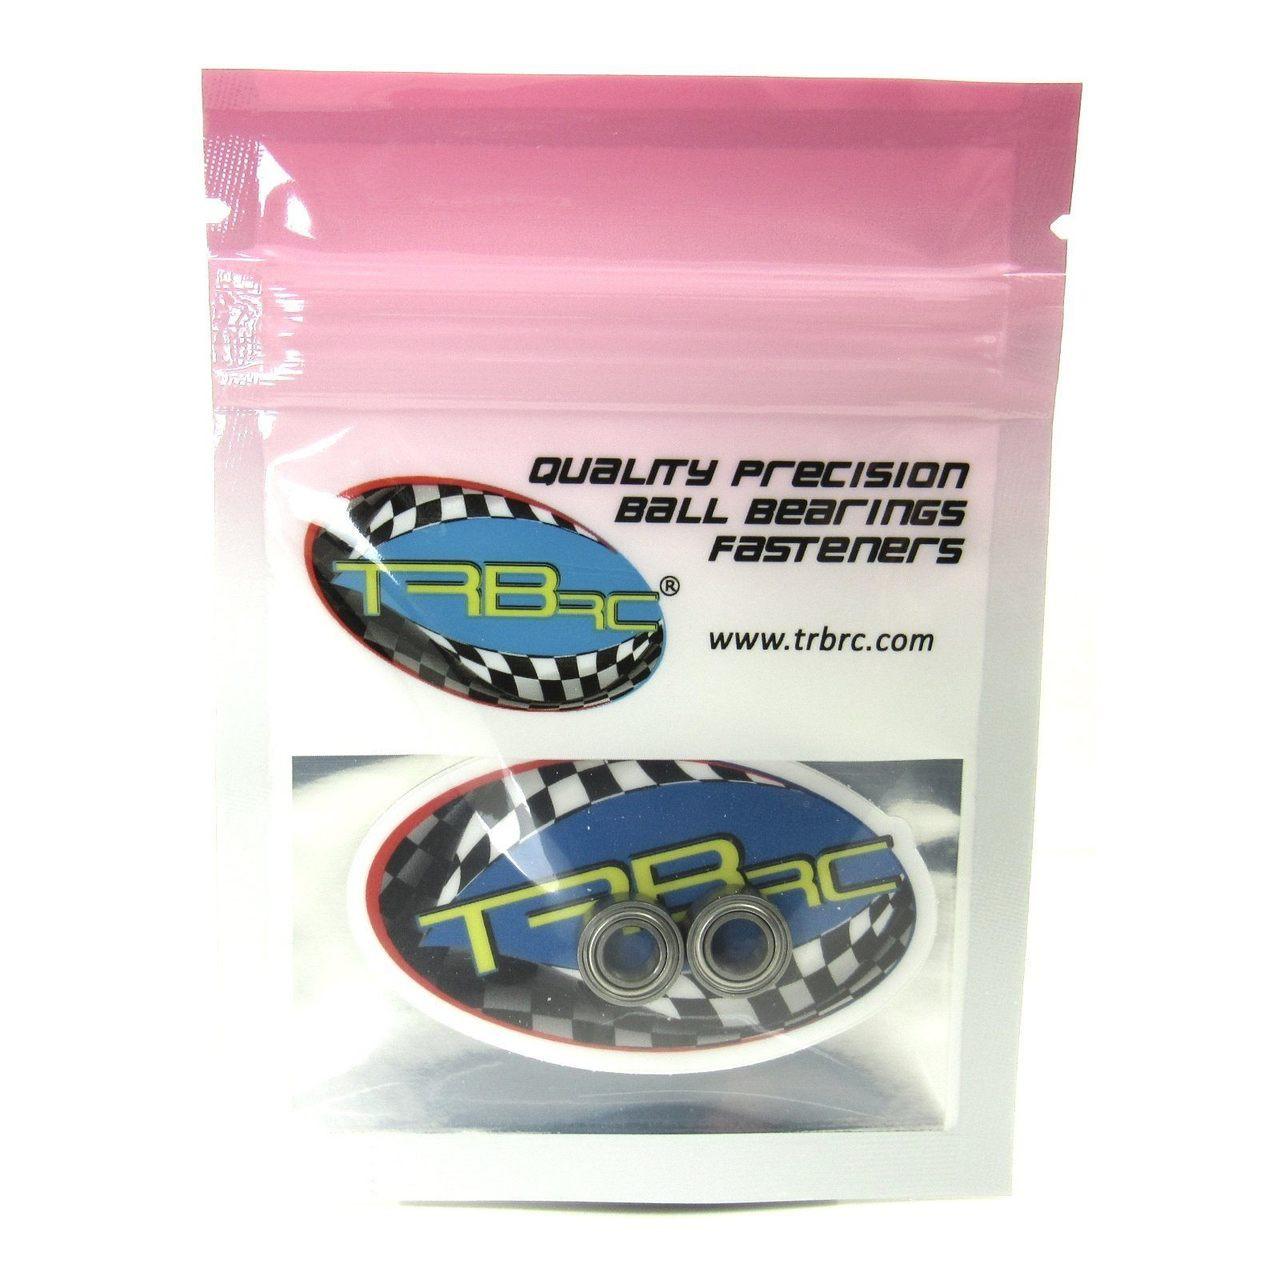 TRB RC 5x10x4mm Precision Ceramic Ball Bearings Metal Shields (2)